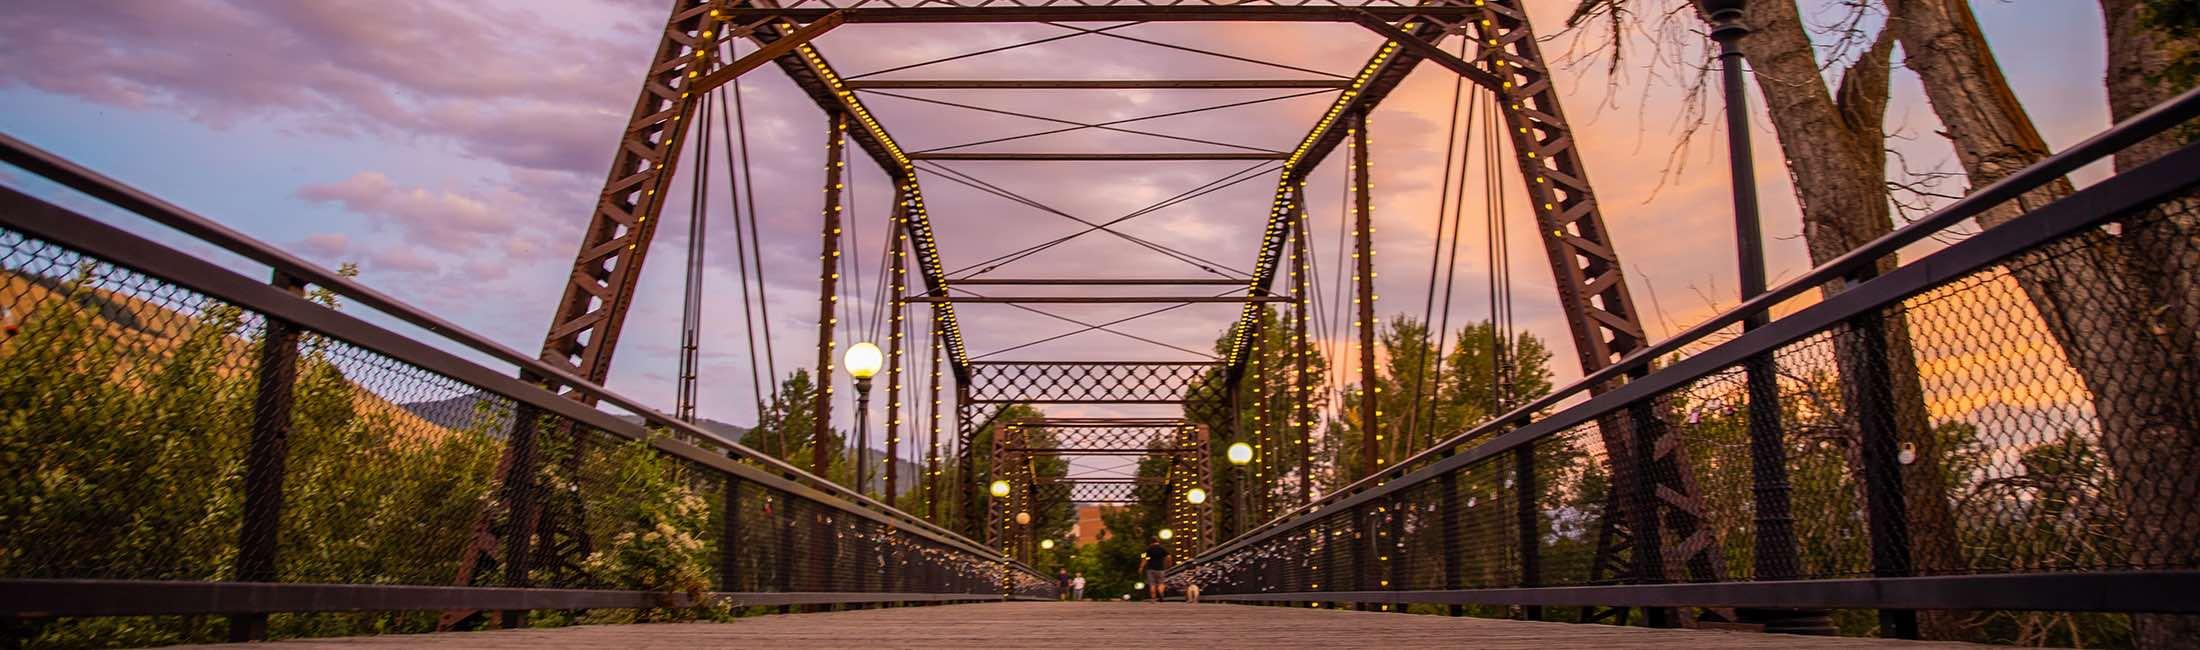 The History Behind Missoula's Iconic Lock Bridge